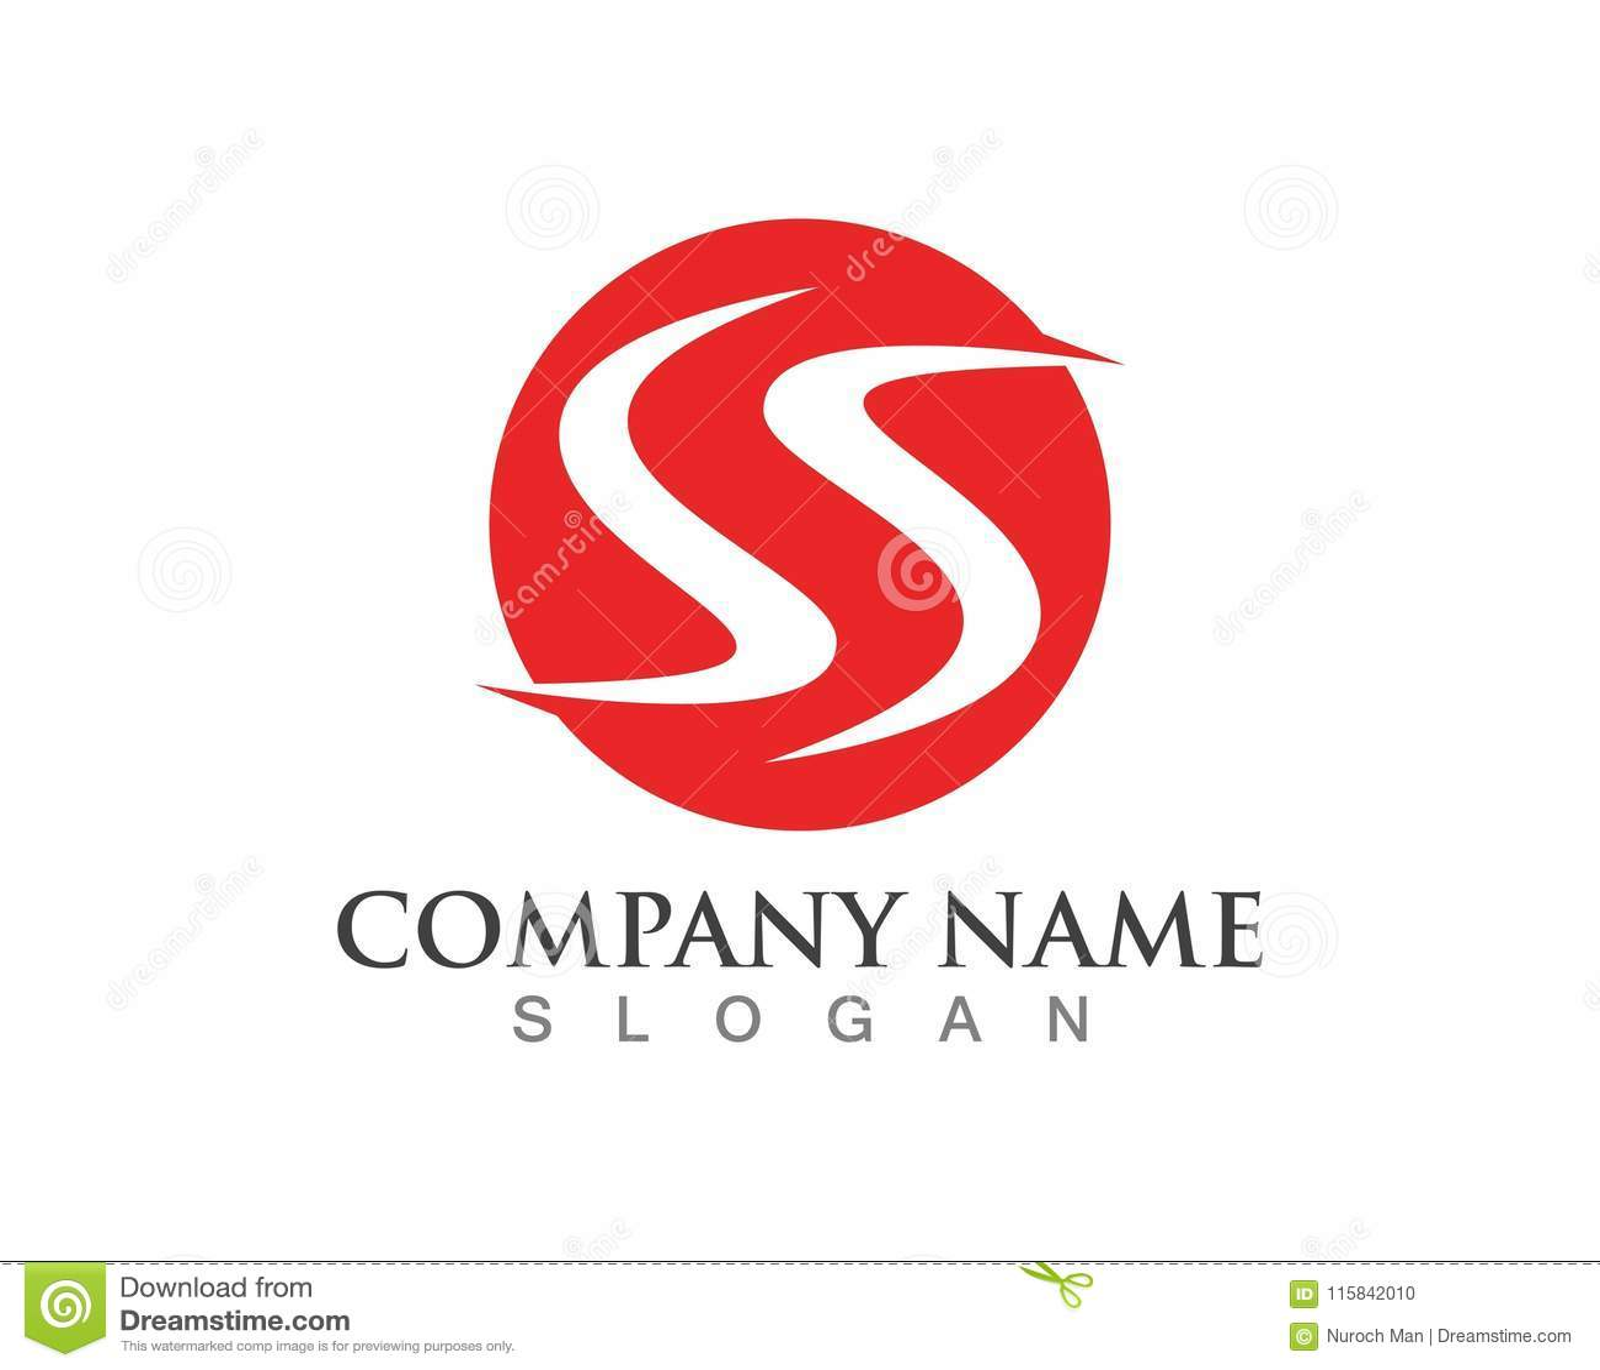 S Letter Logos Vector Symbols Stock Vector Illustration Of Shiny